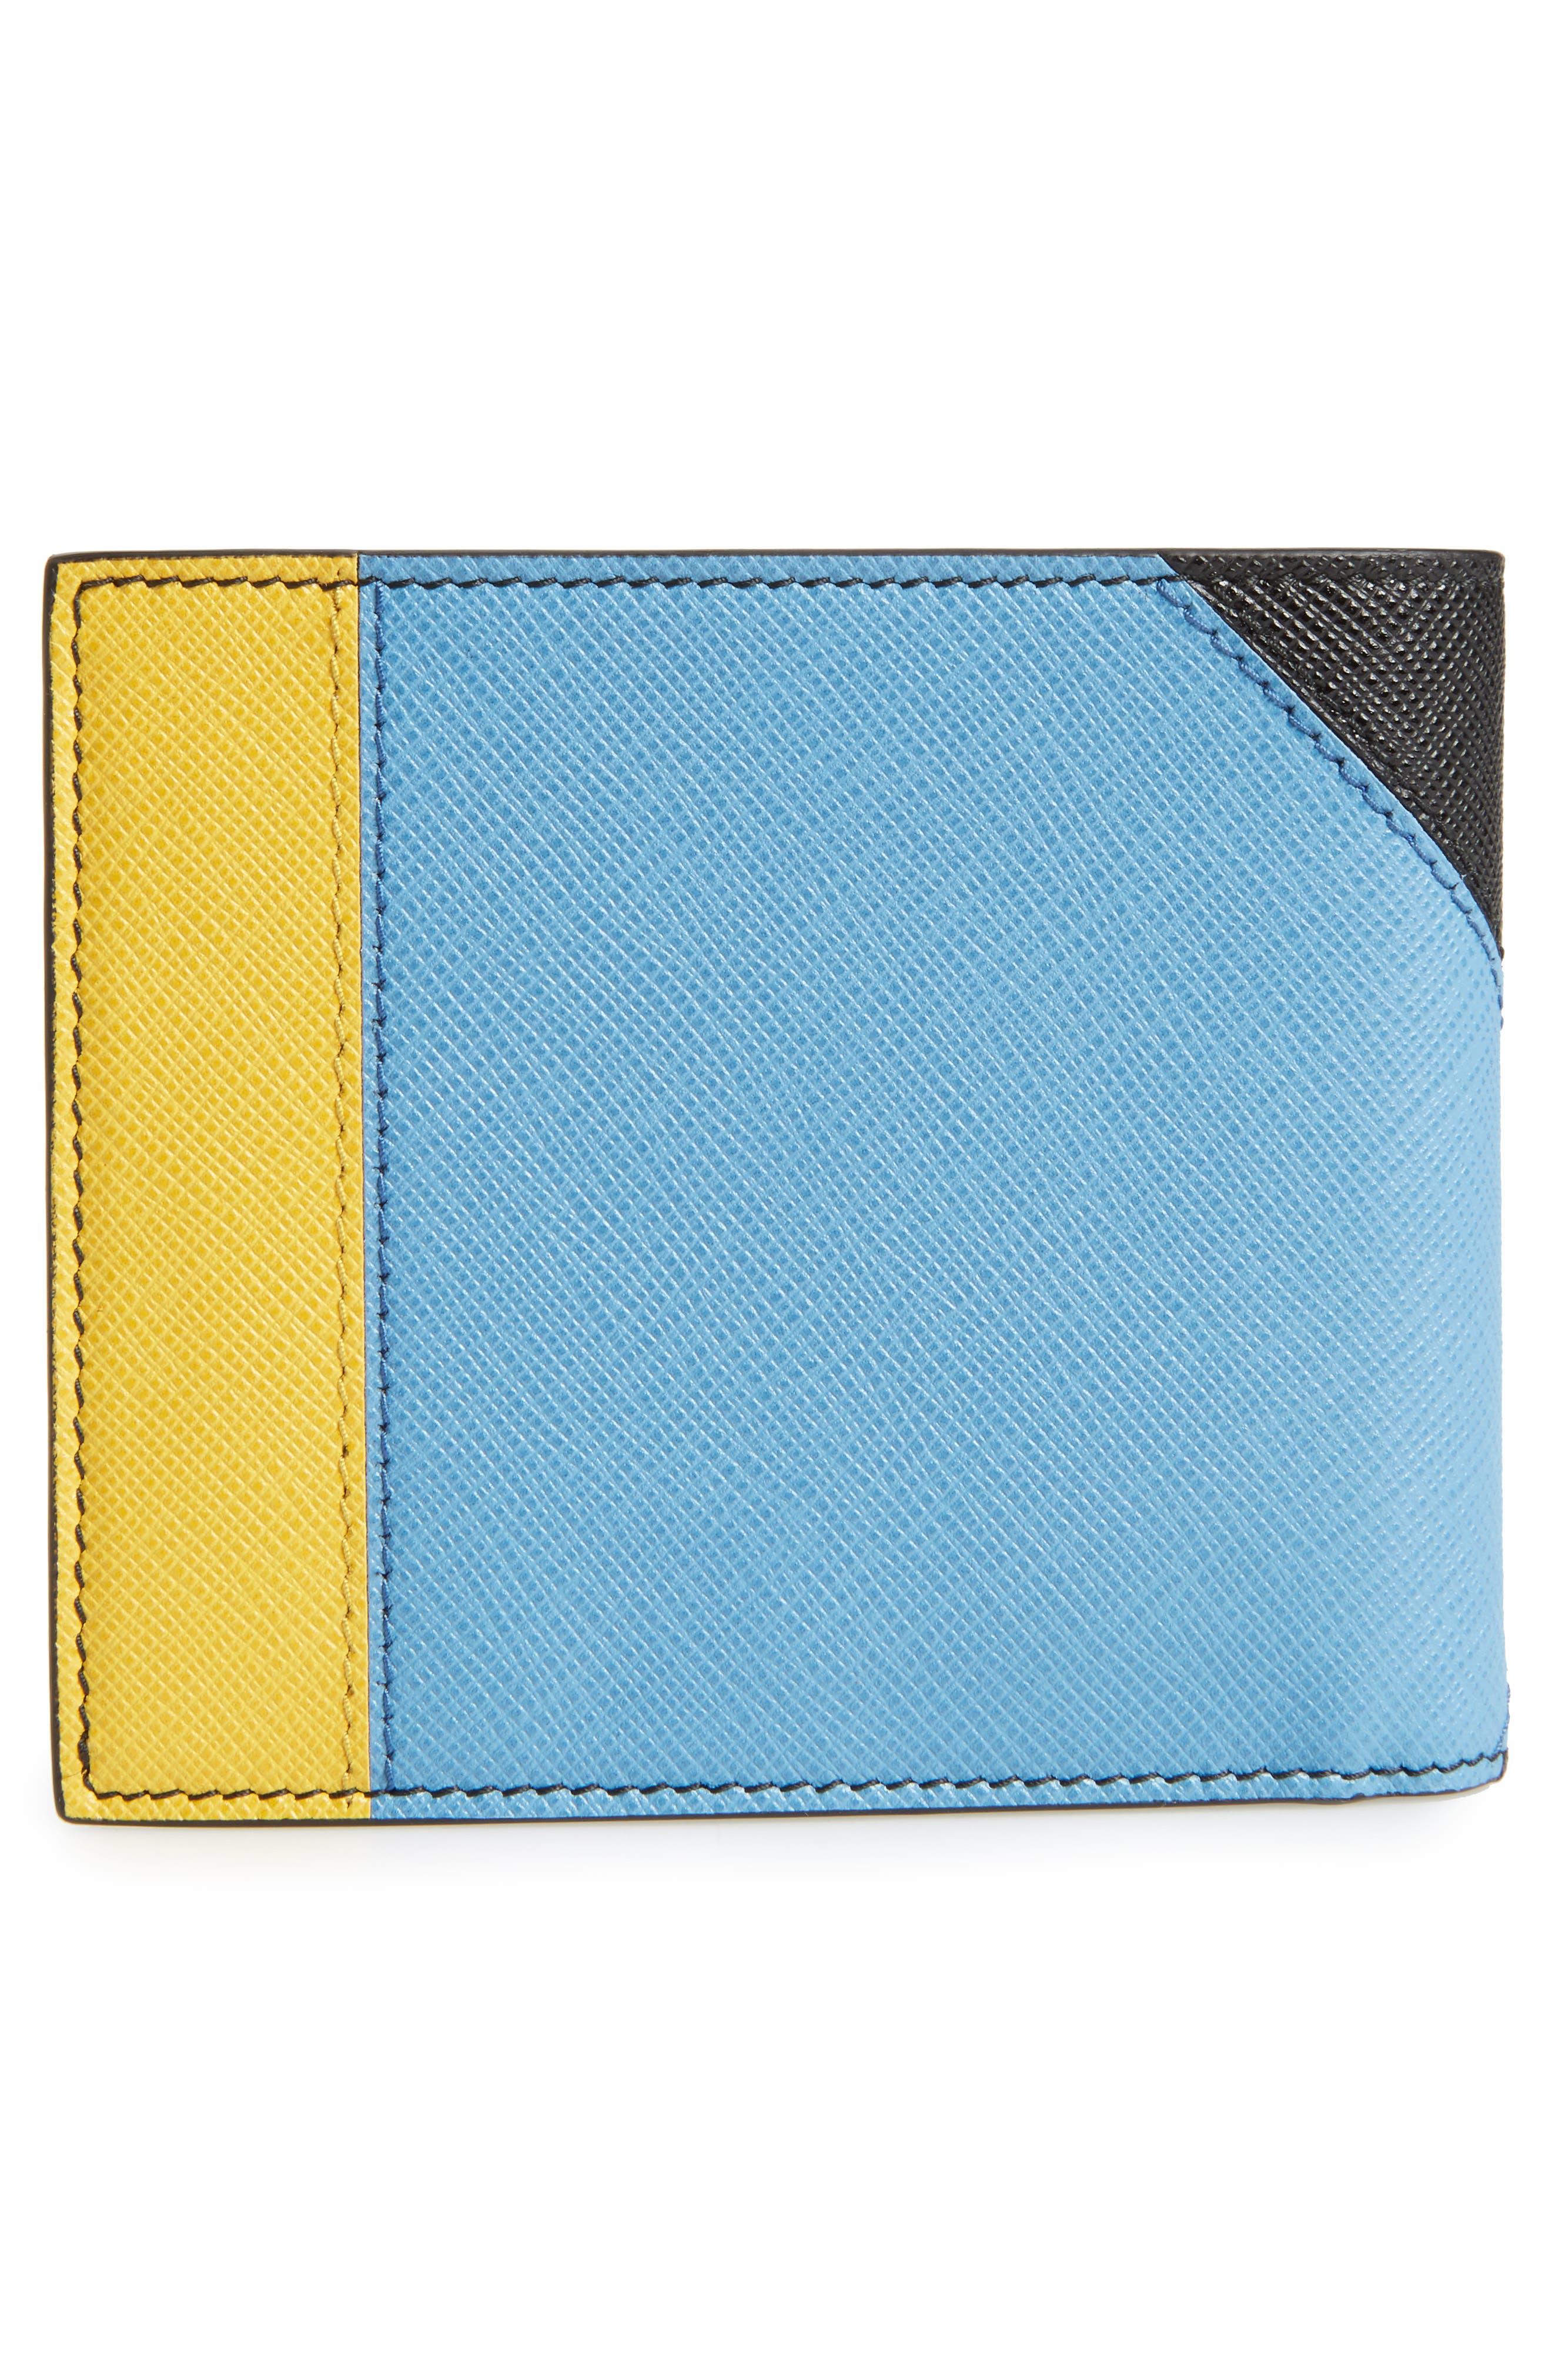 Arrow Calfskin Leather Wallet,                             Alternate thumbnail 3, color,                             911